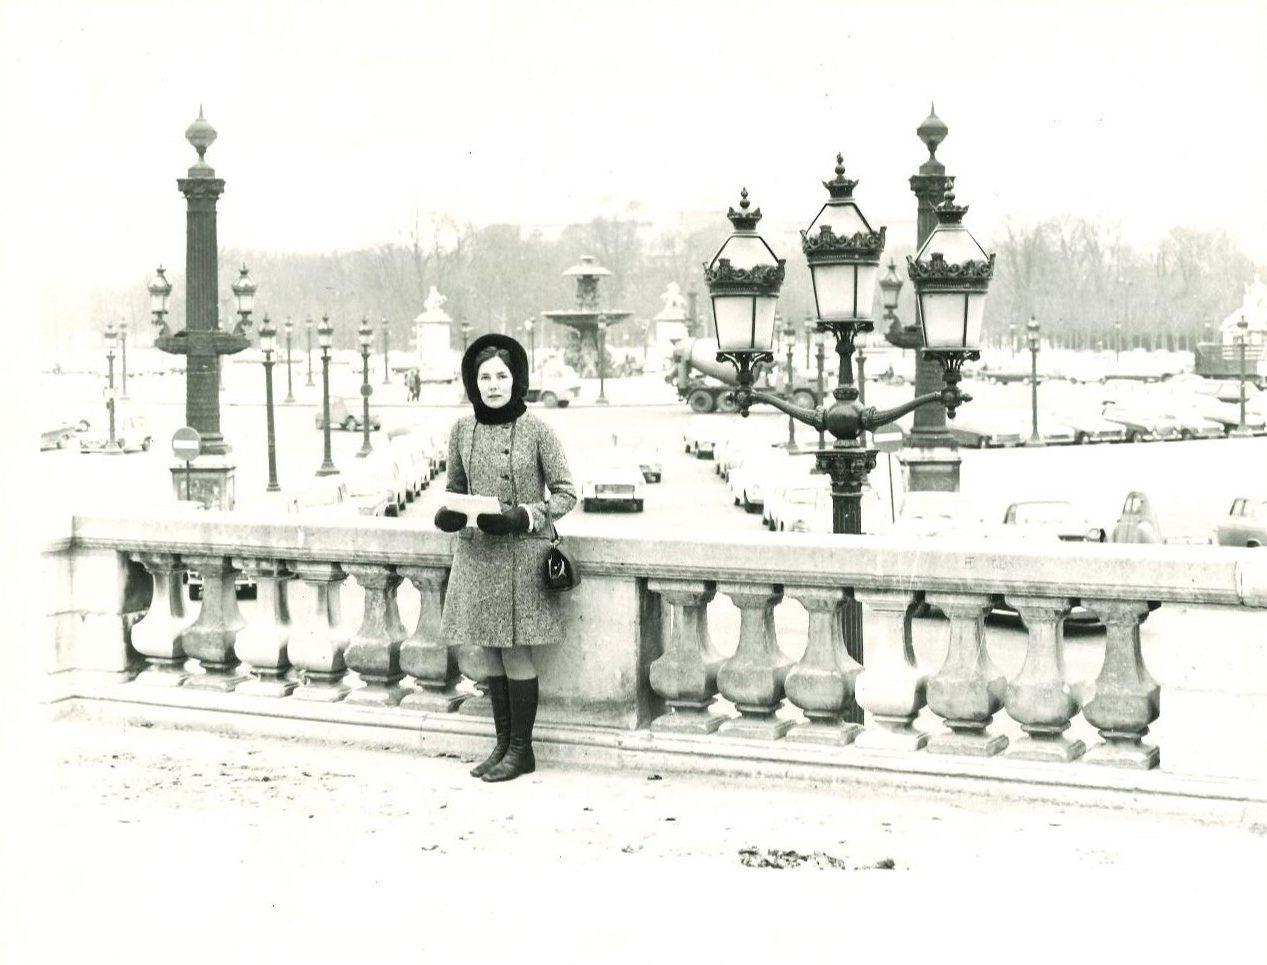 Mary Webb in Paris to visit Sonia Delaunay, 1961